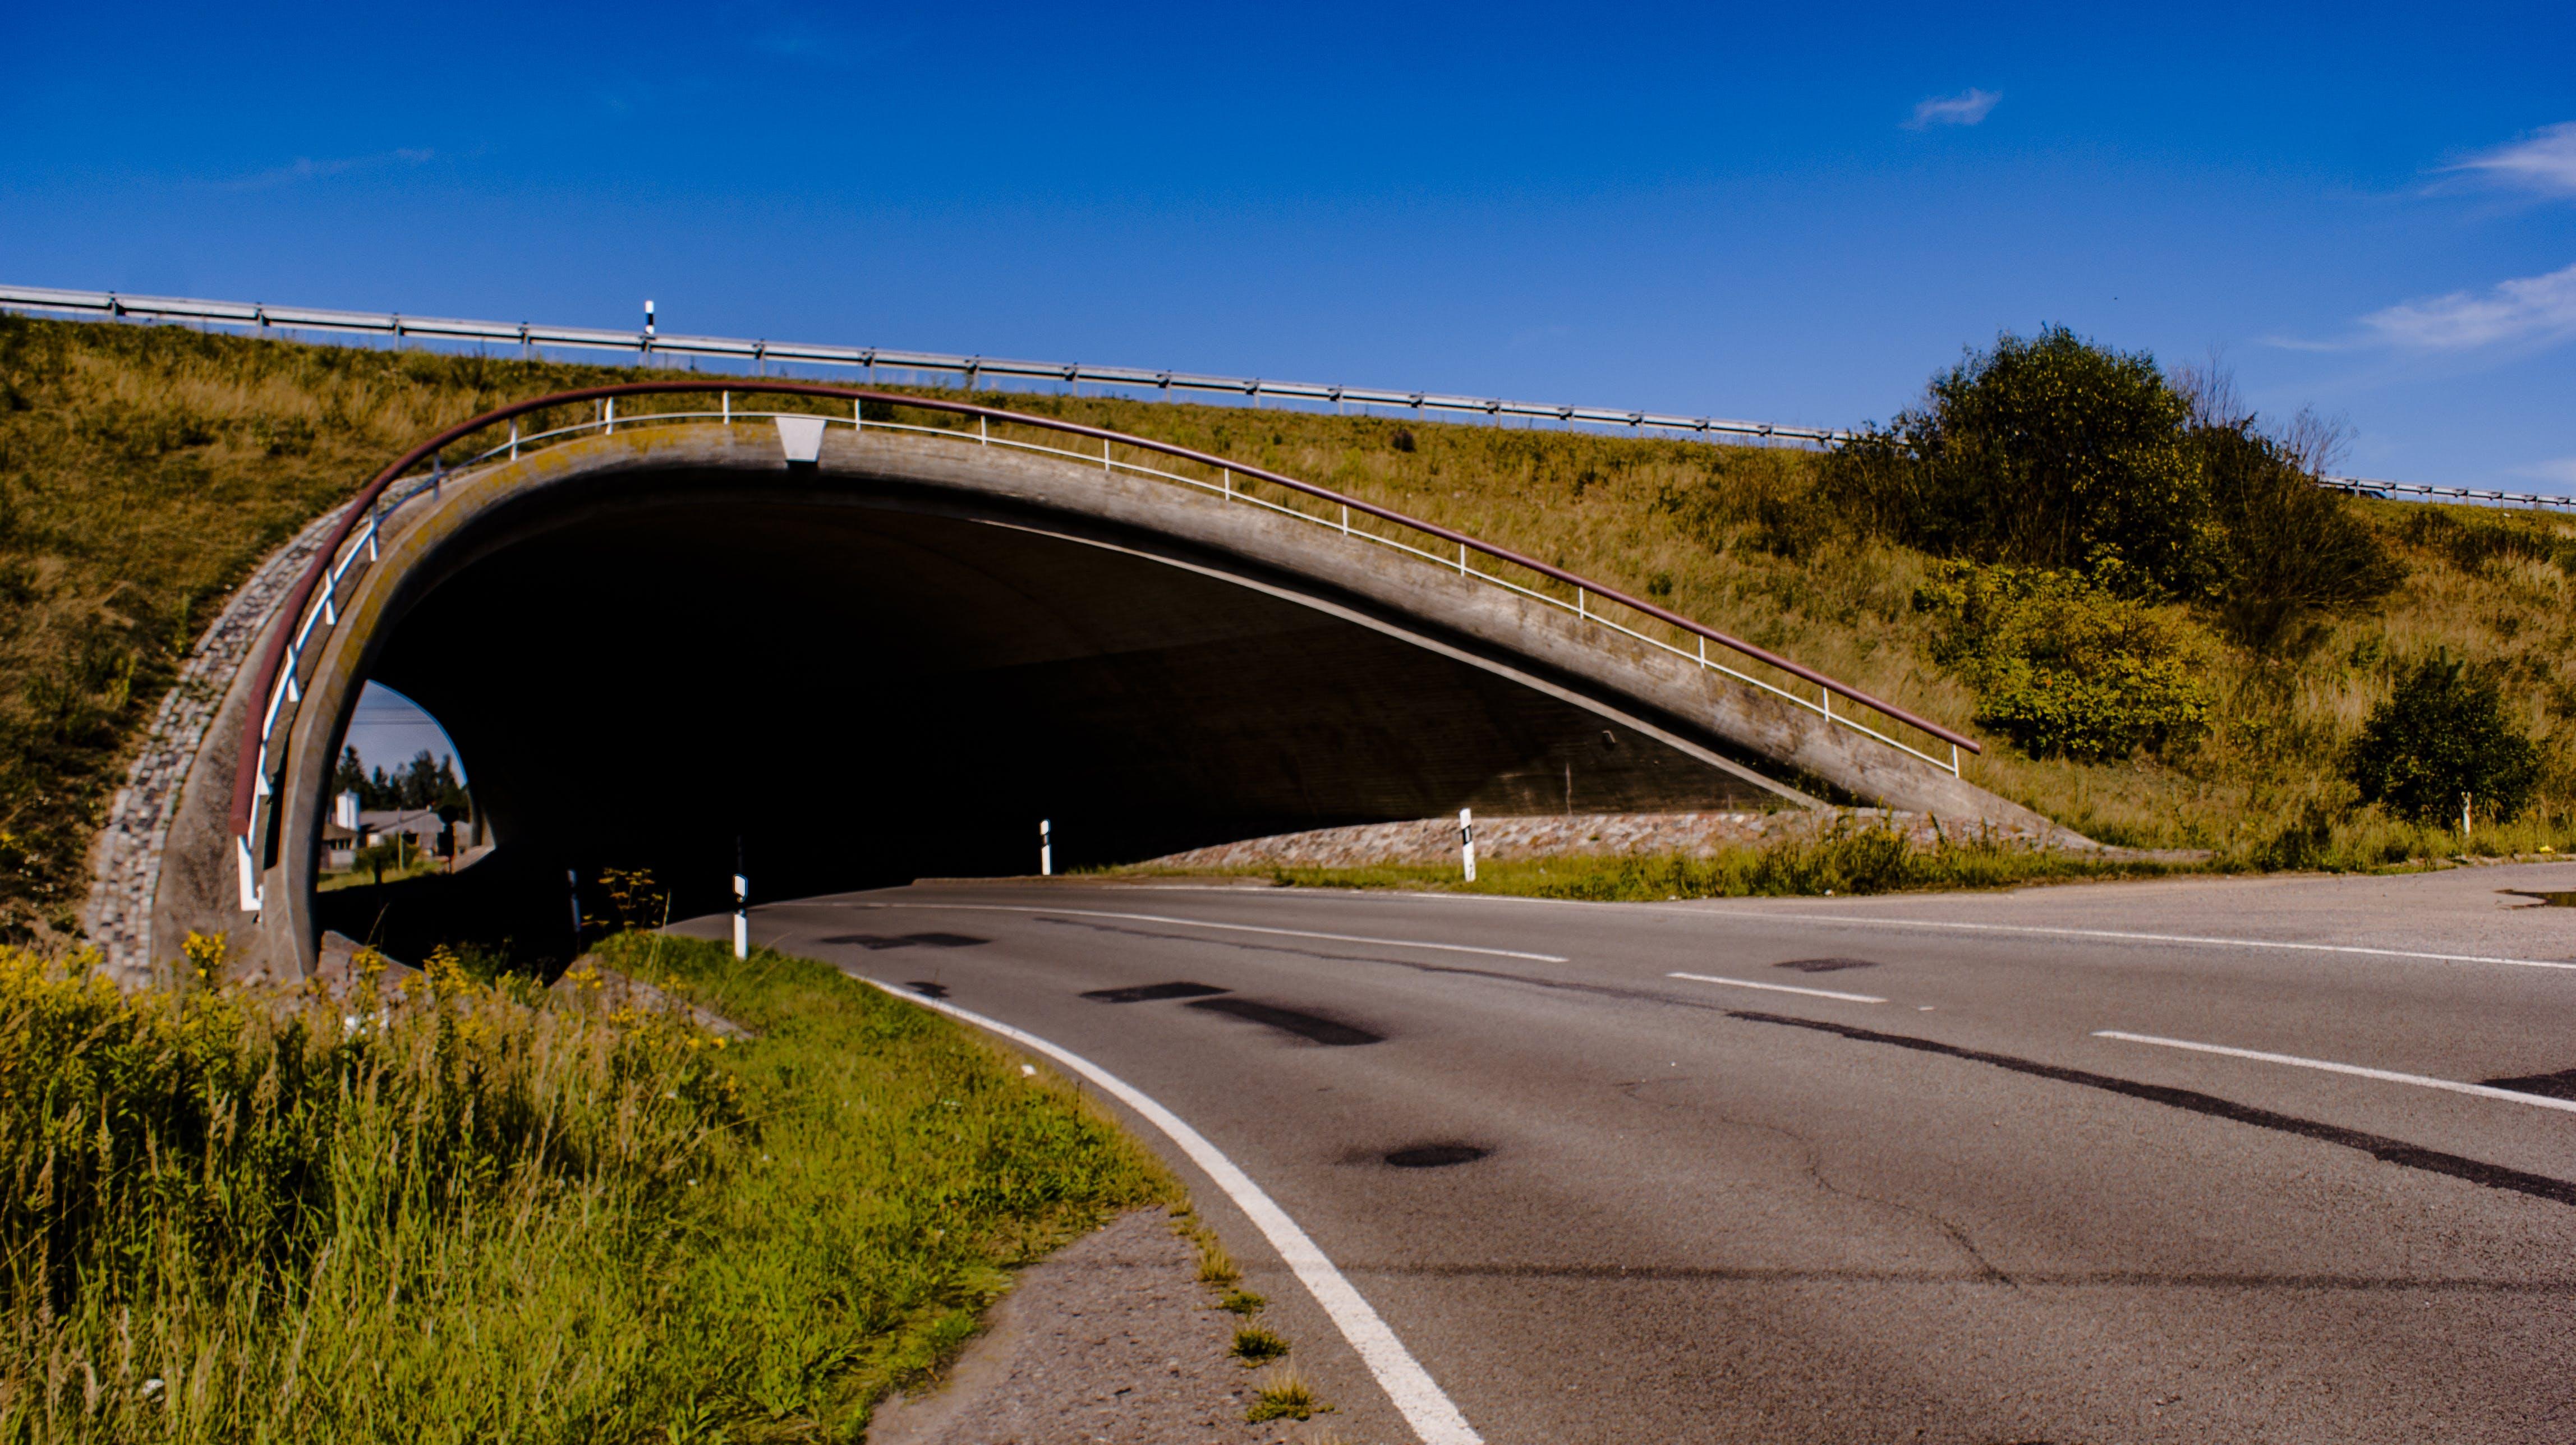 Free stock photo of empty street, landscape, tunnel